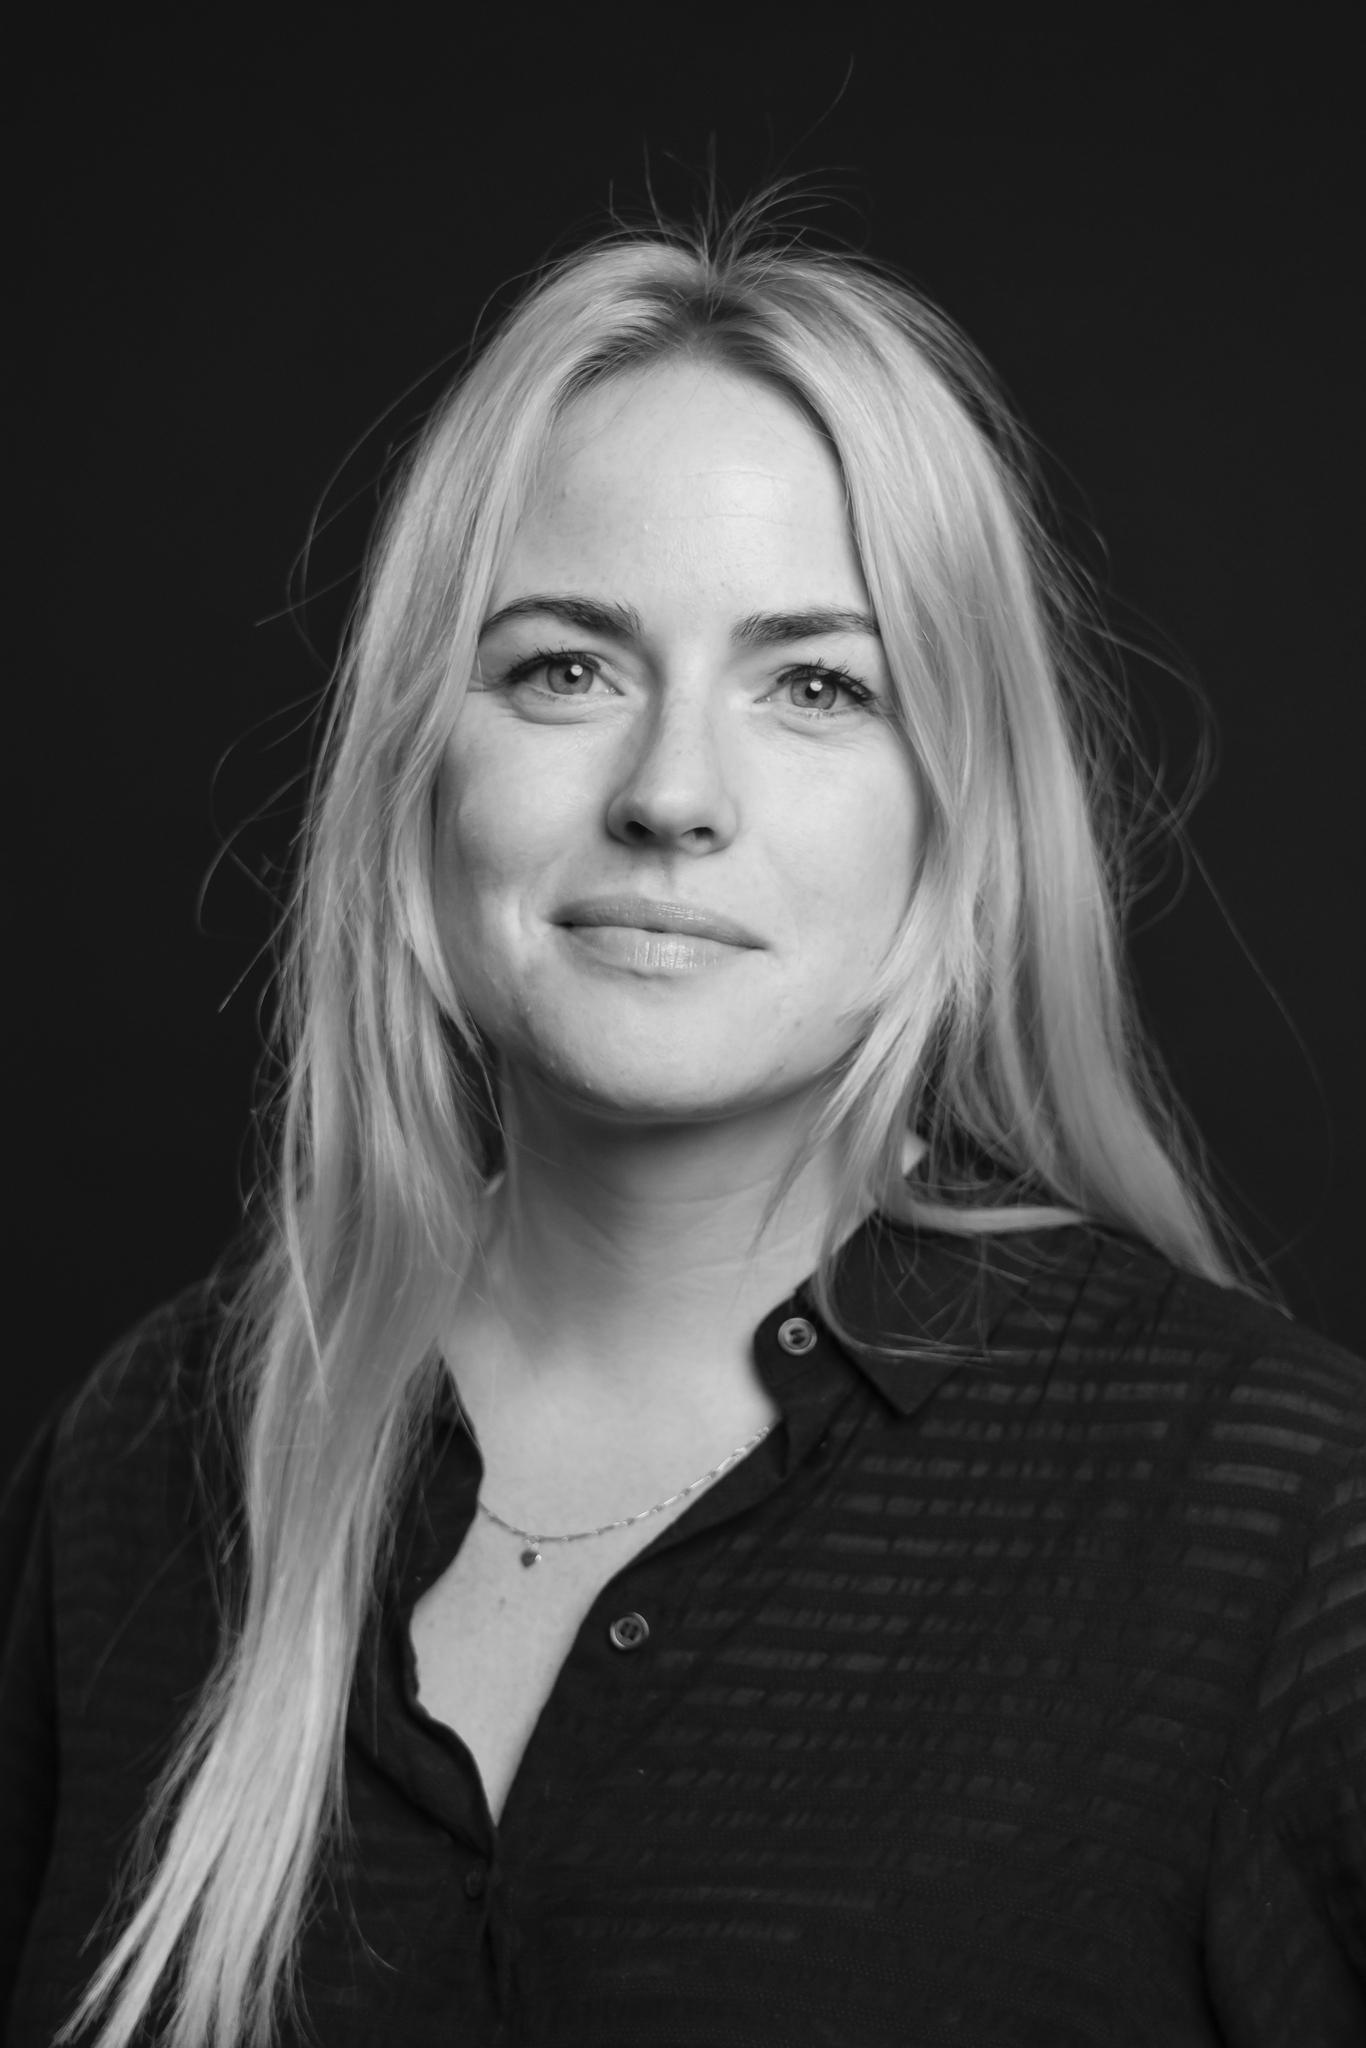 Jenny Thyrhaug image 1